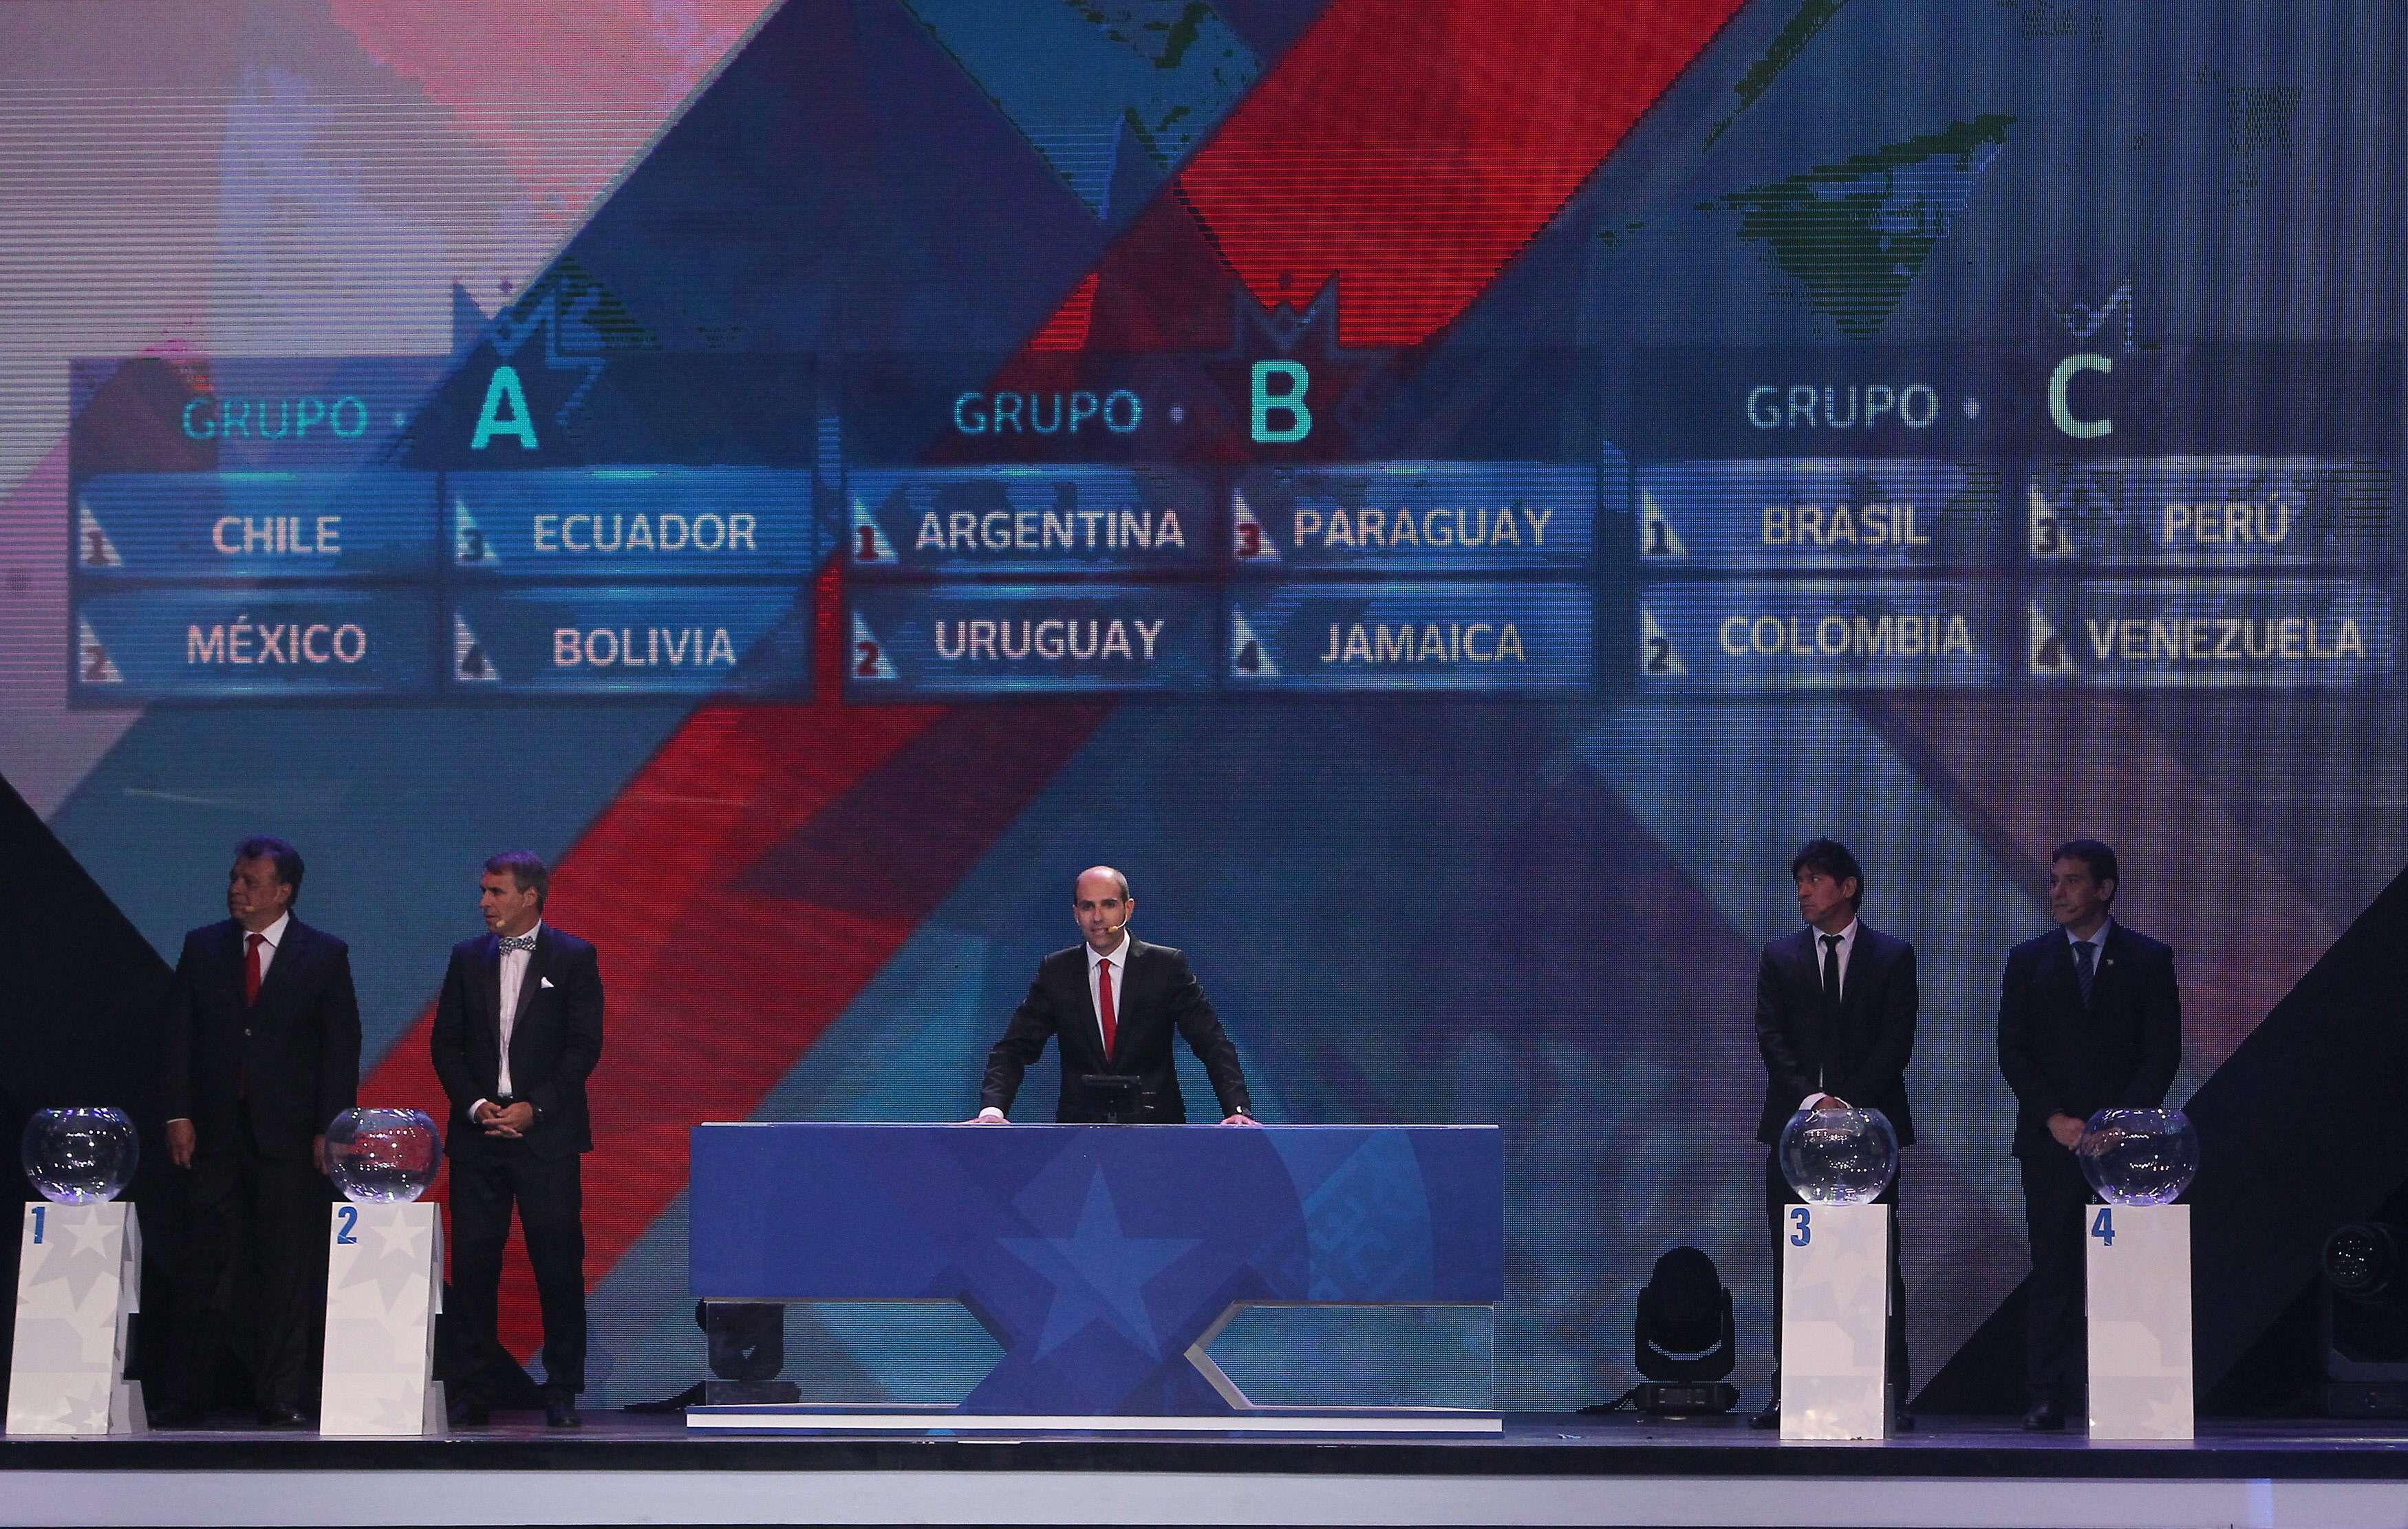 Sorteio da Copa América definiu Brasil x Colômbia e Argentina x Uruguai logo na primeira fase Foto: Mario Ruiz/EFE